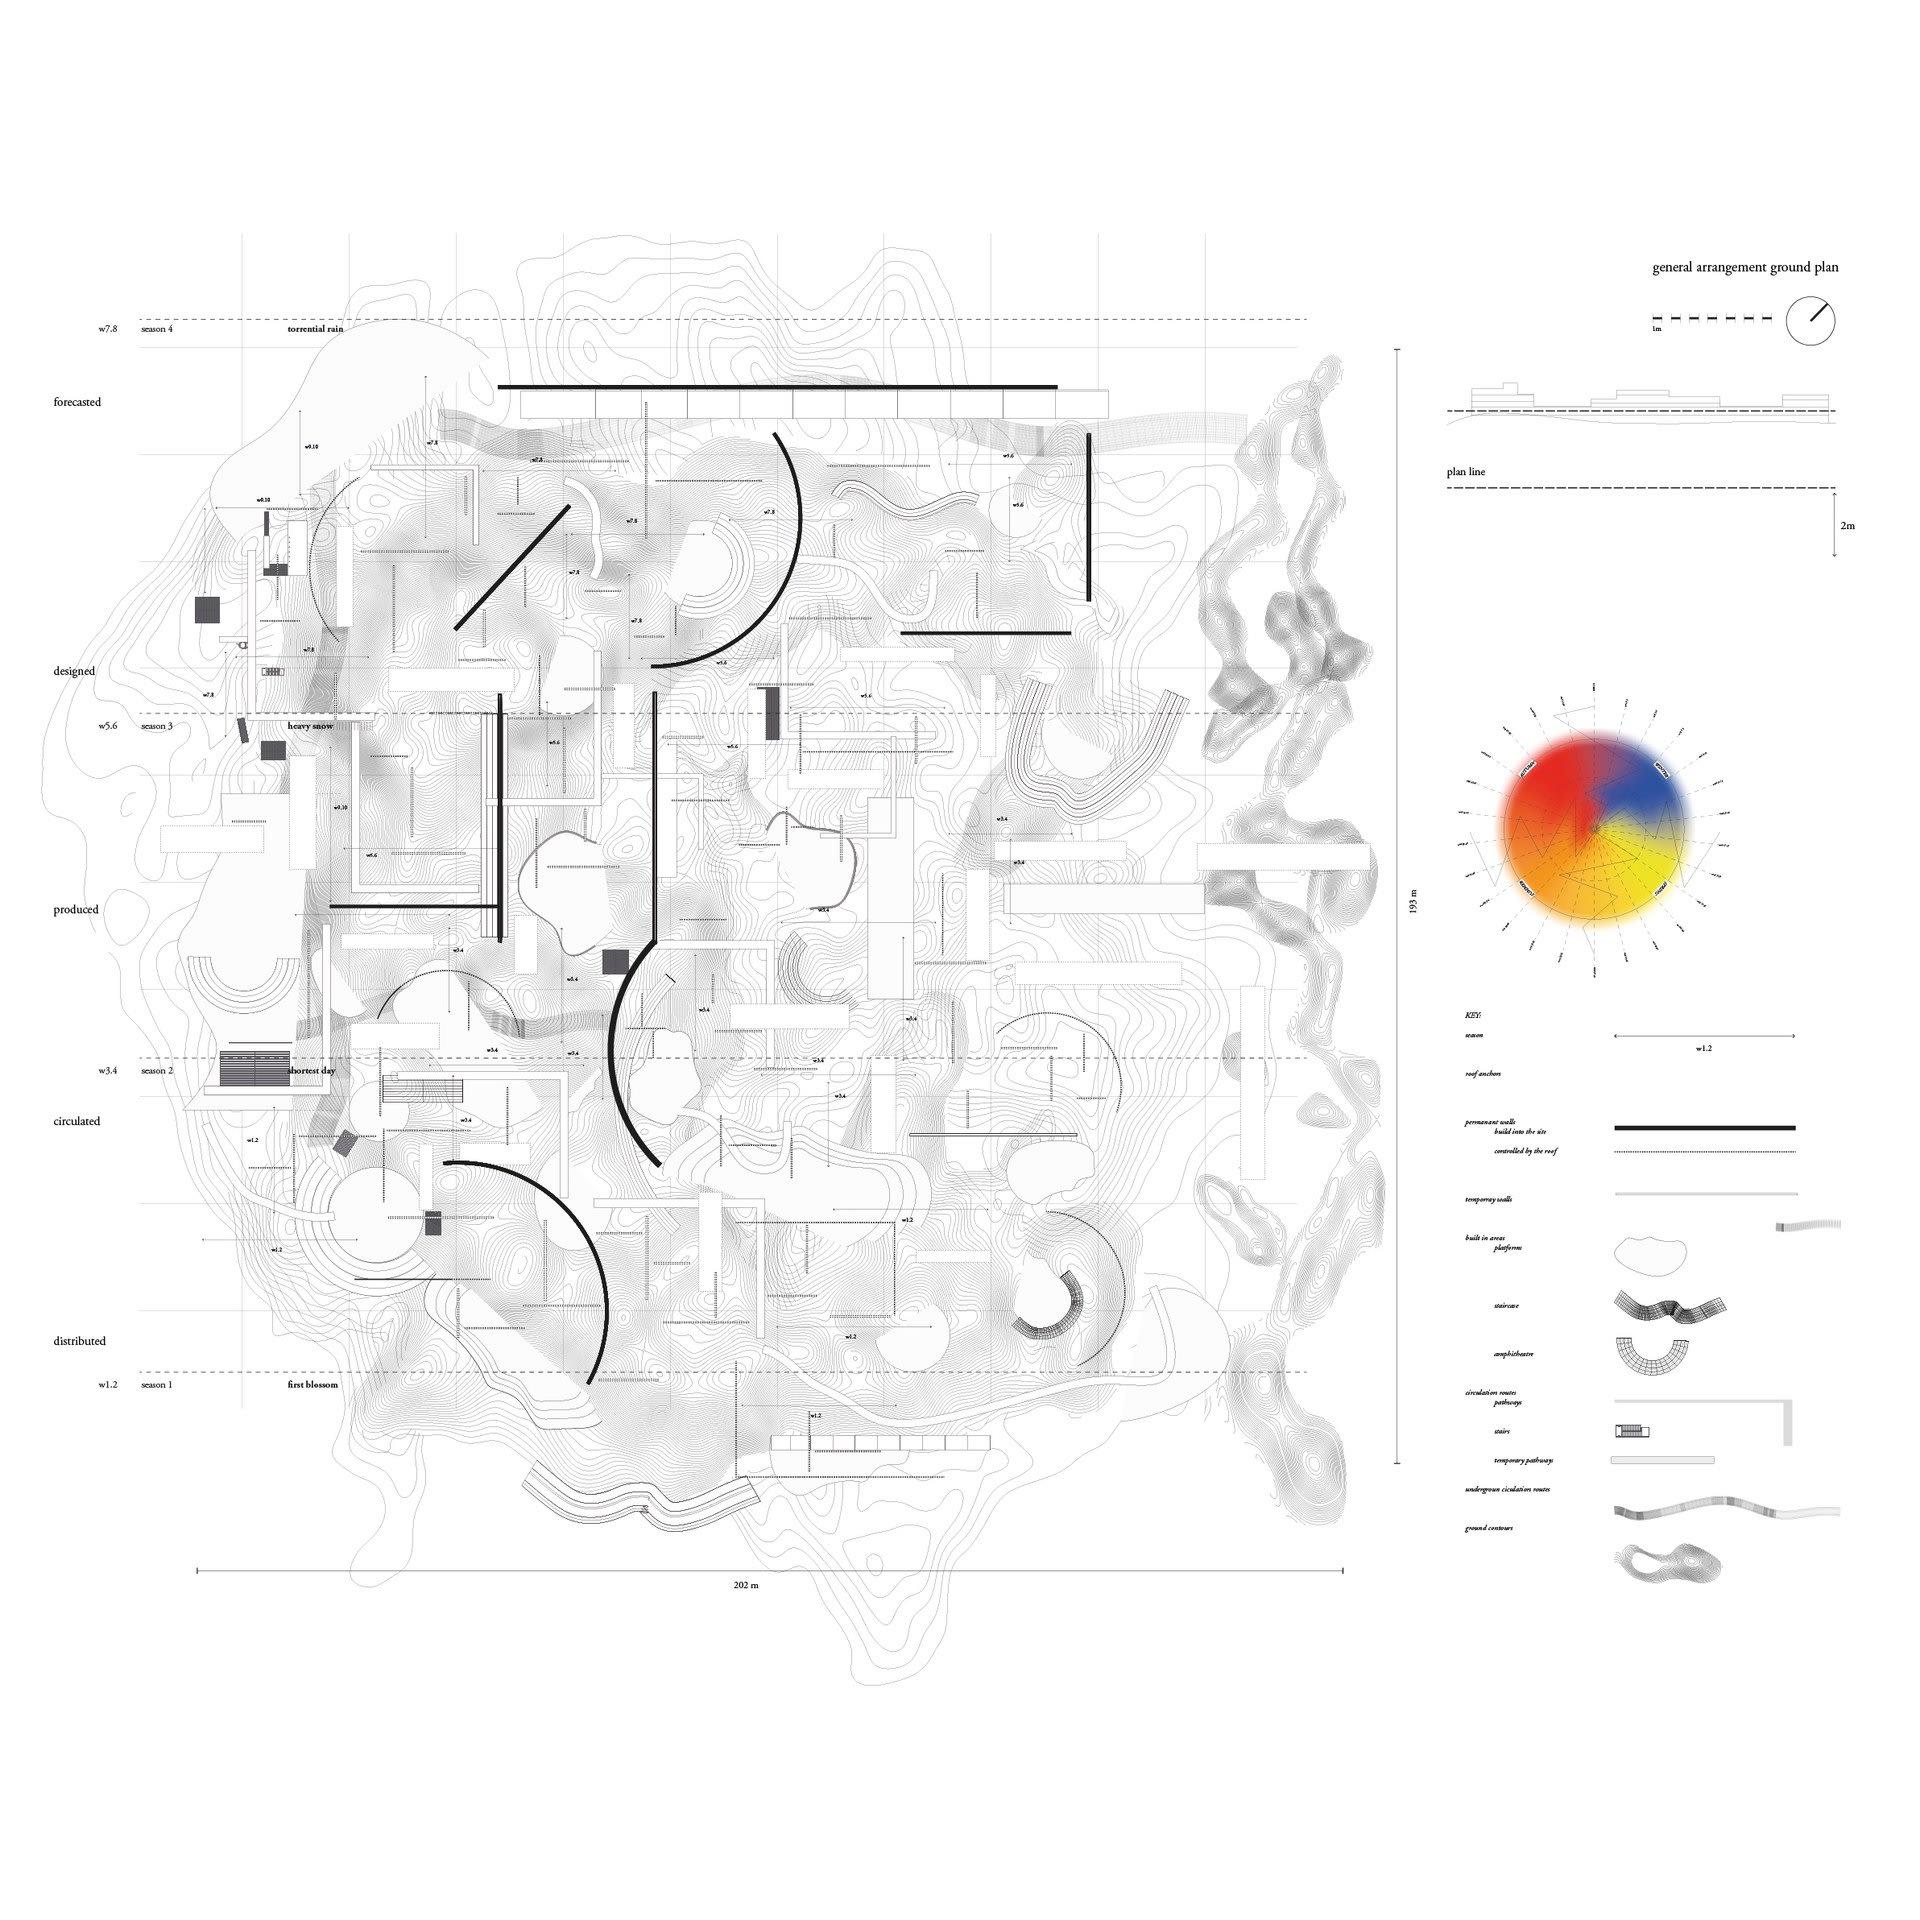 w1.s7 building plan